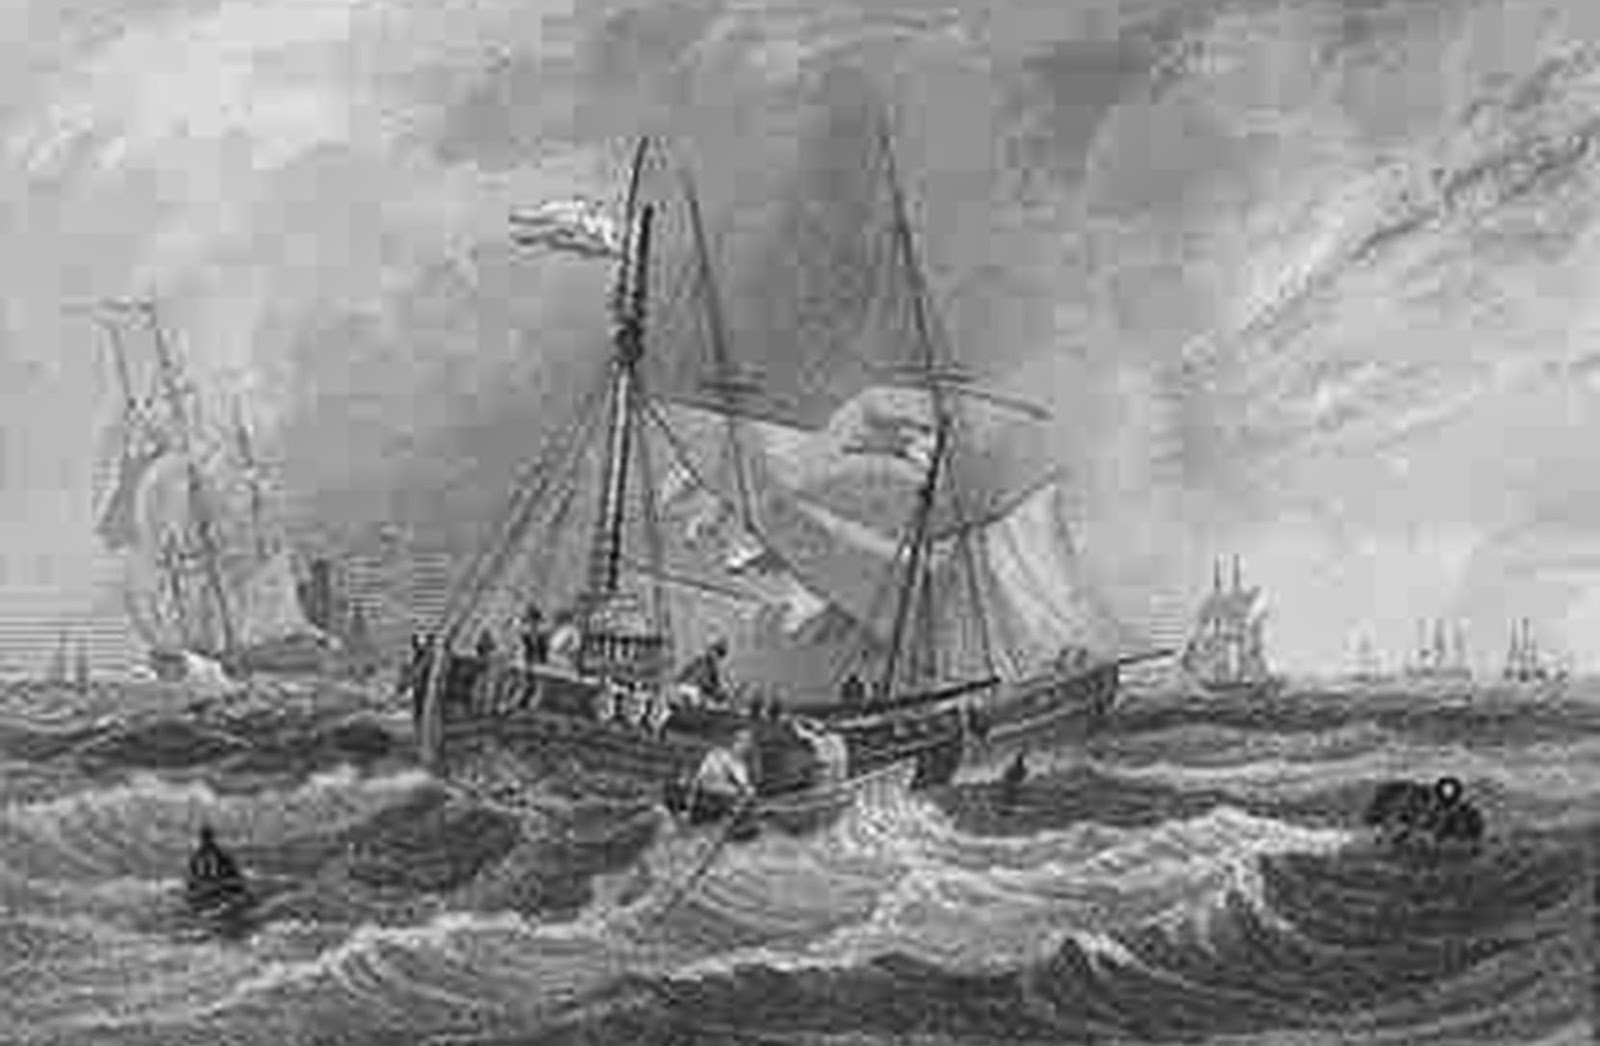 Rock Hard Buoy Simply Forgot Us War Pirate Ship Likewise Rms Titanic Sinking On Tall Diagram Kent England Tombleson Engraving 1840 Barrel